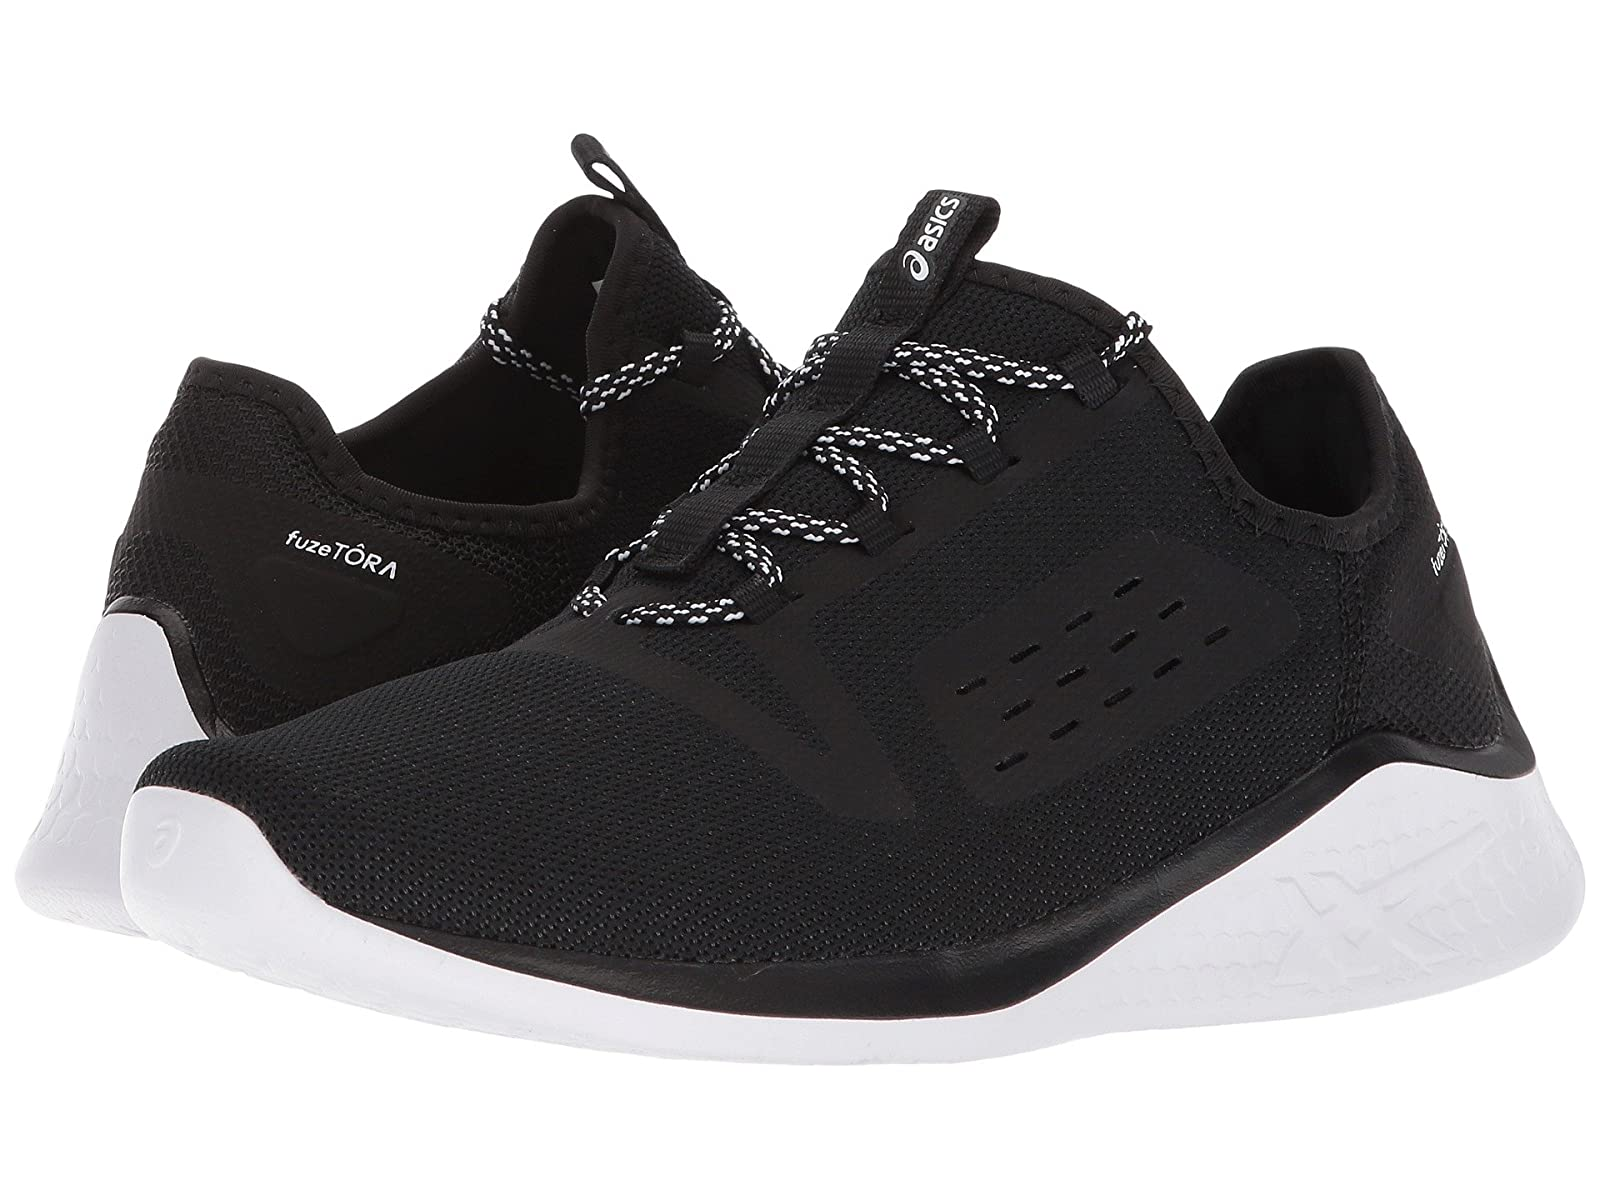 ASICS fuzeTORAAtmospheric grades have affordable shoes